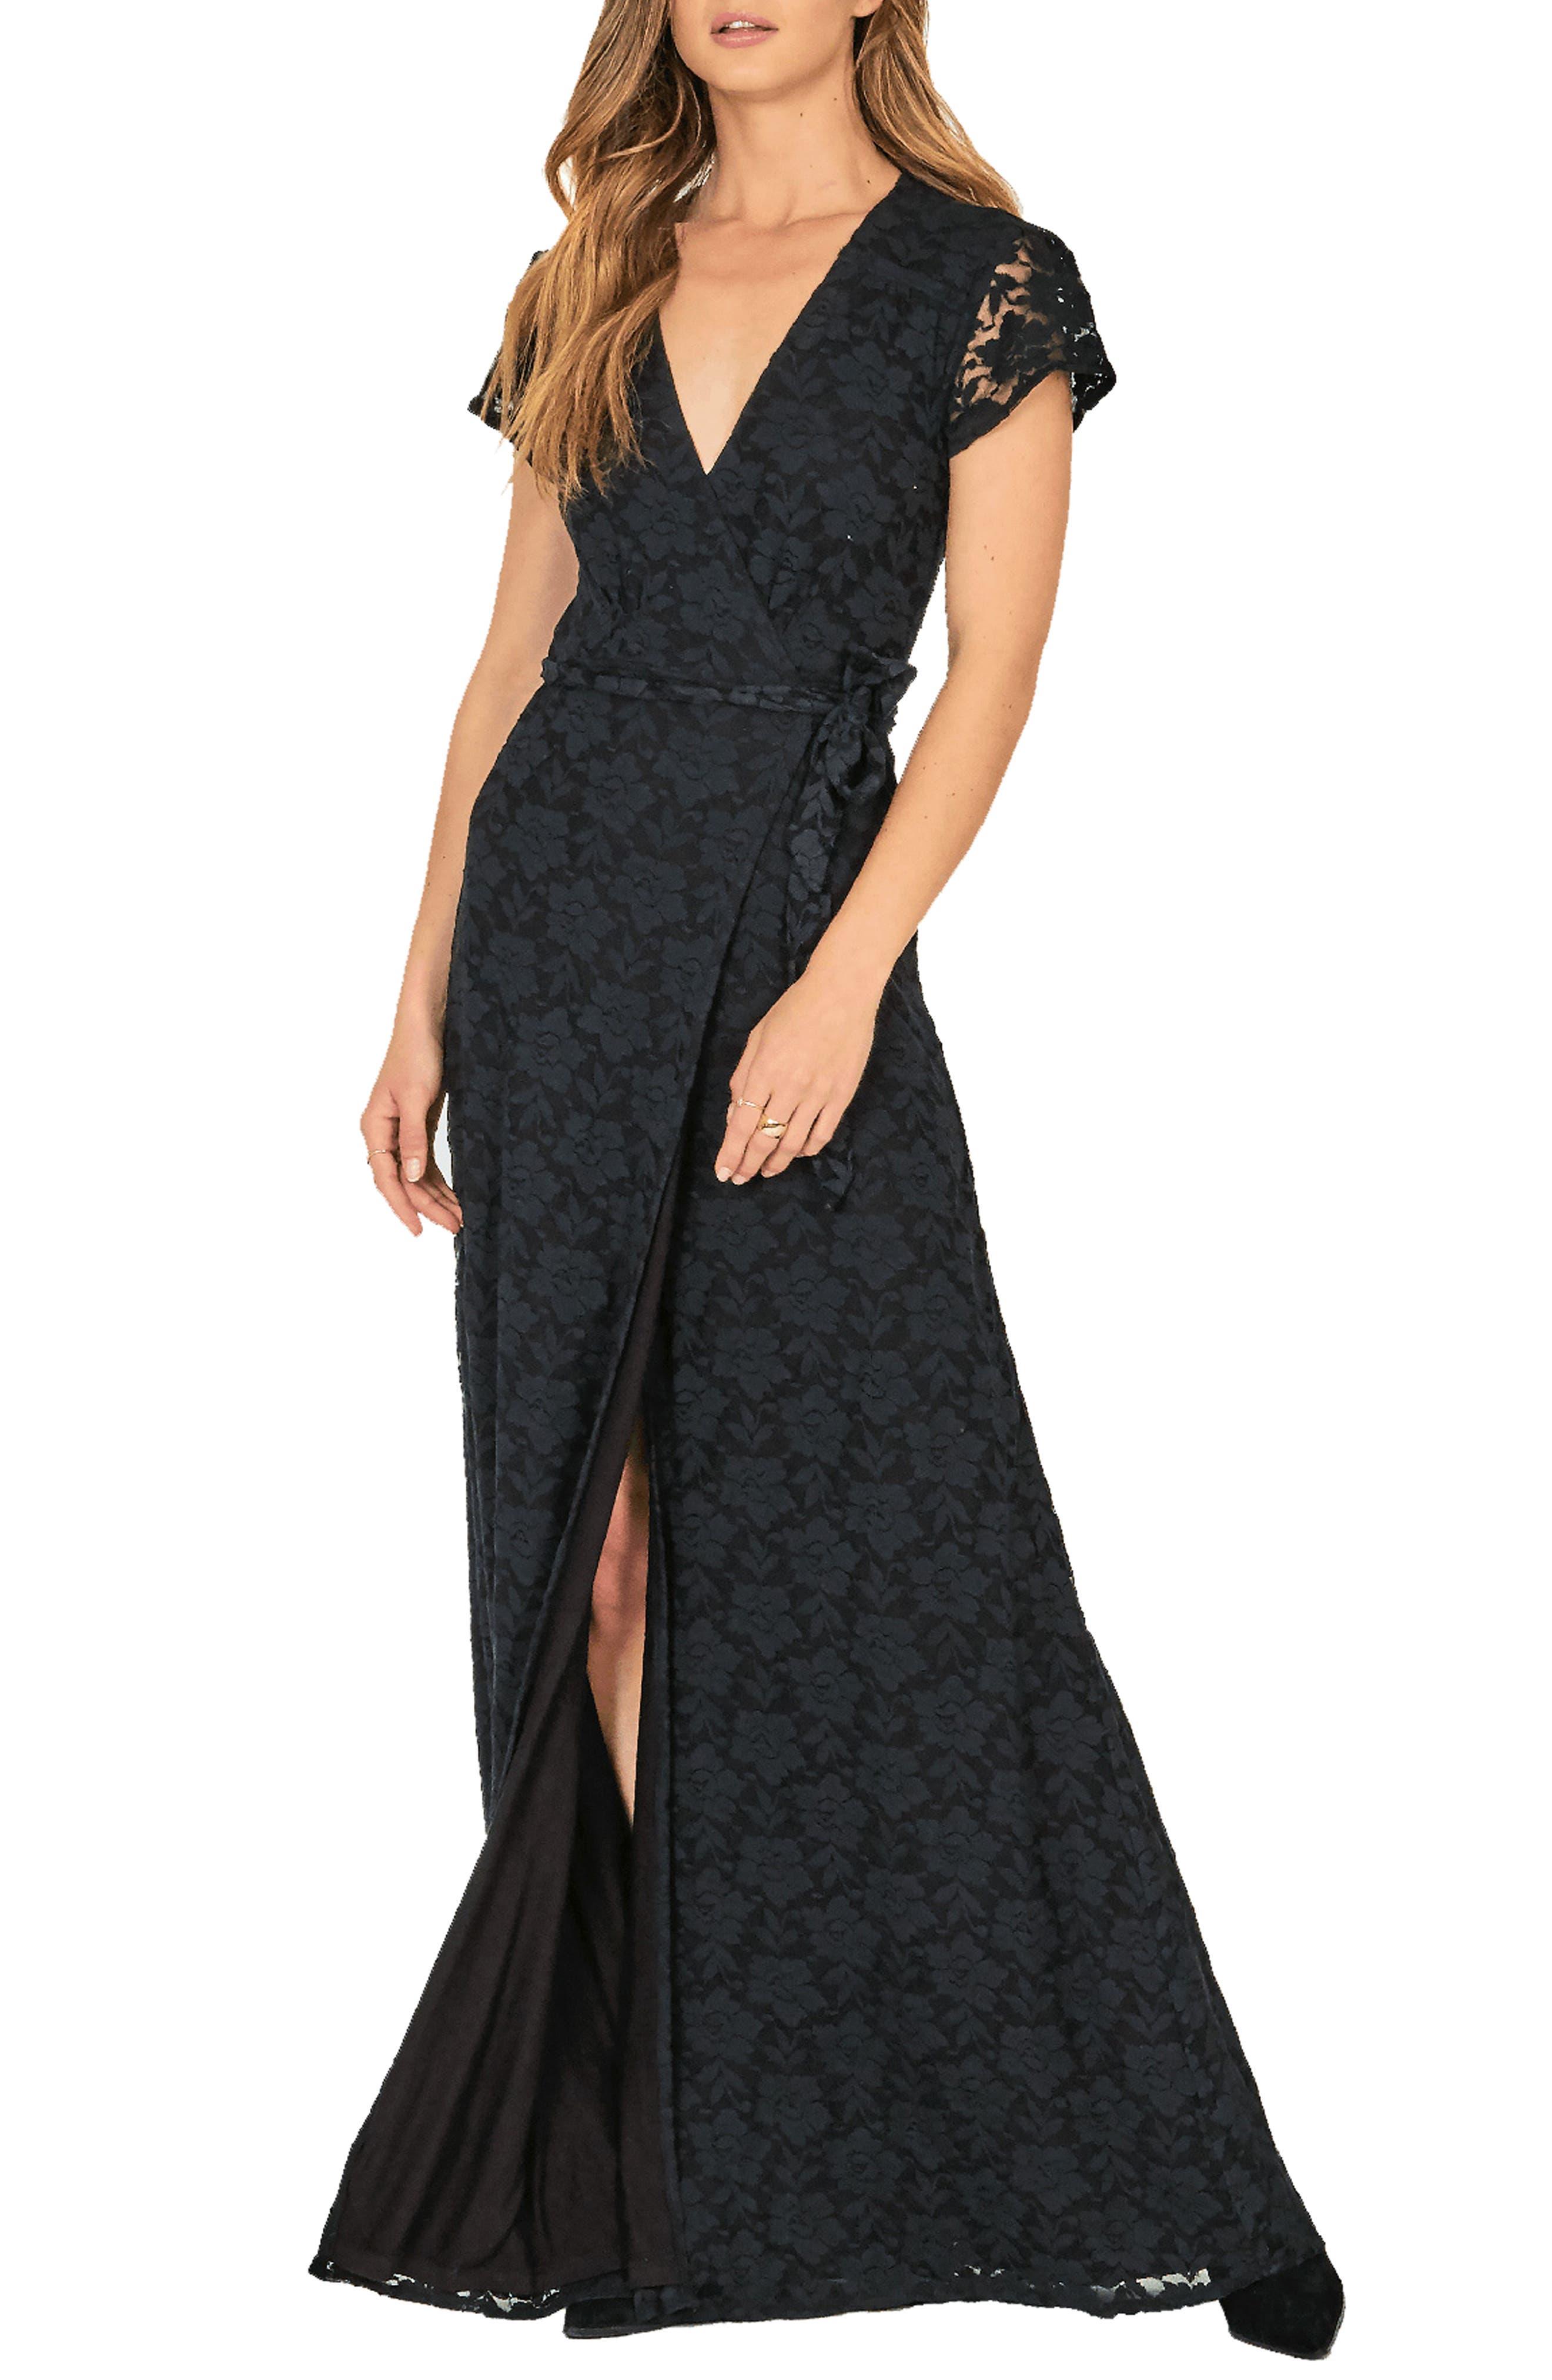 Amuse Society Great Lengths Wrap Dress, Black